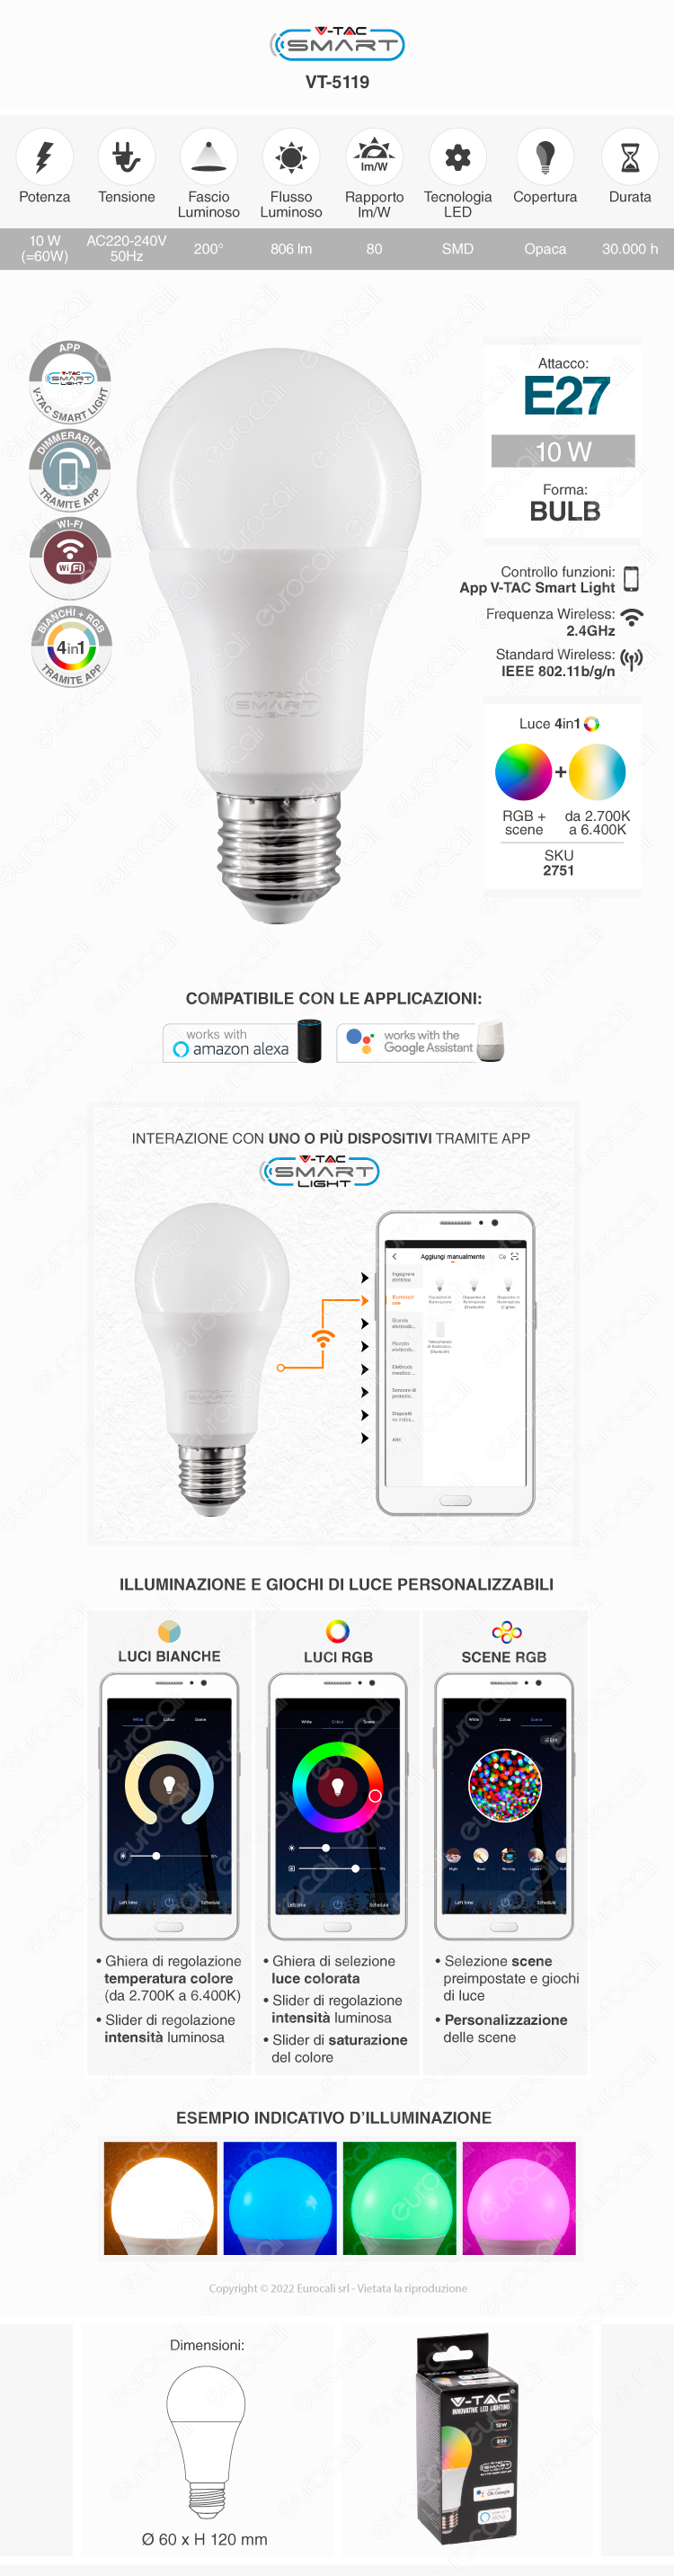 V-Tac Smart VT-5119 Lampadina LED Wi-Fi E27 10W Bulb A60 RGB+W Dimmerabile